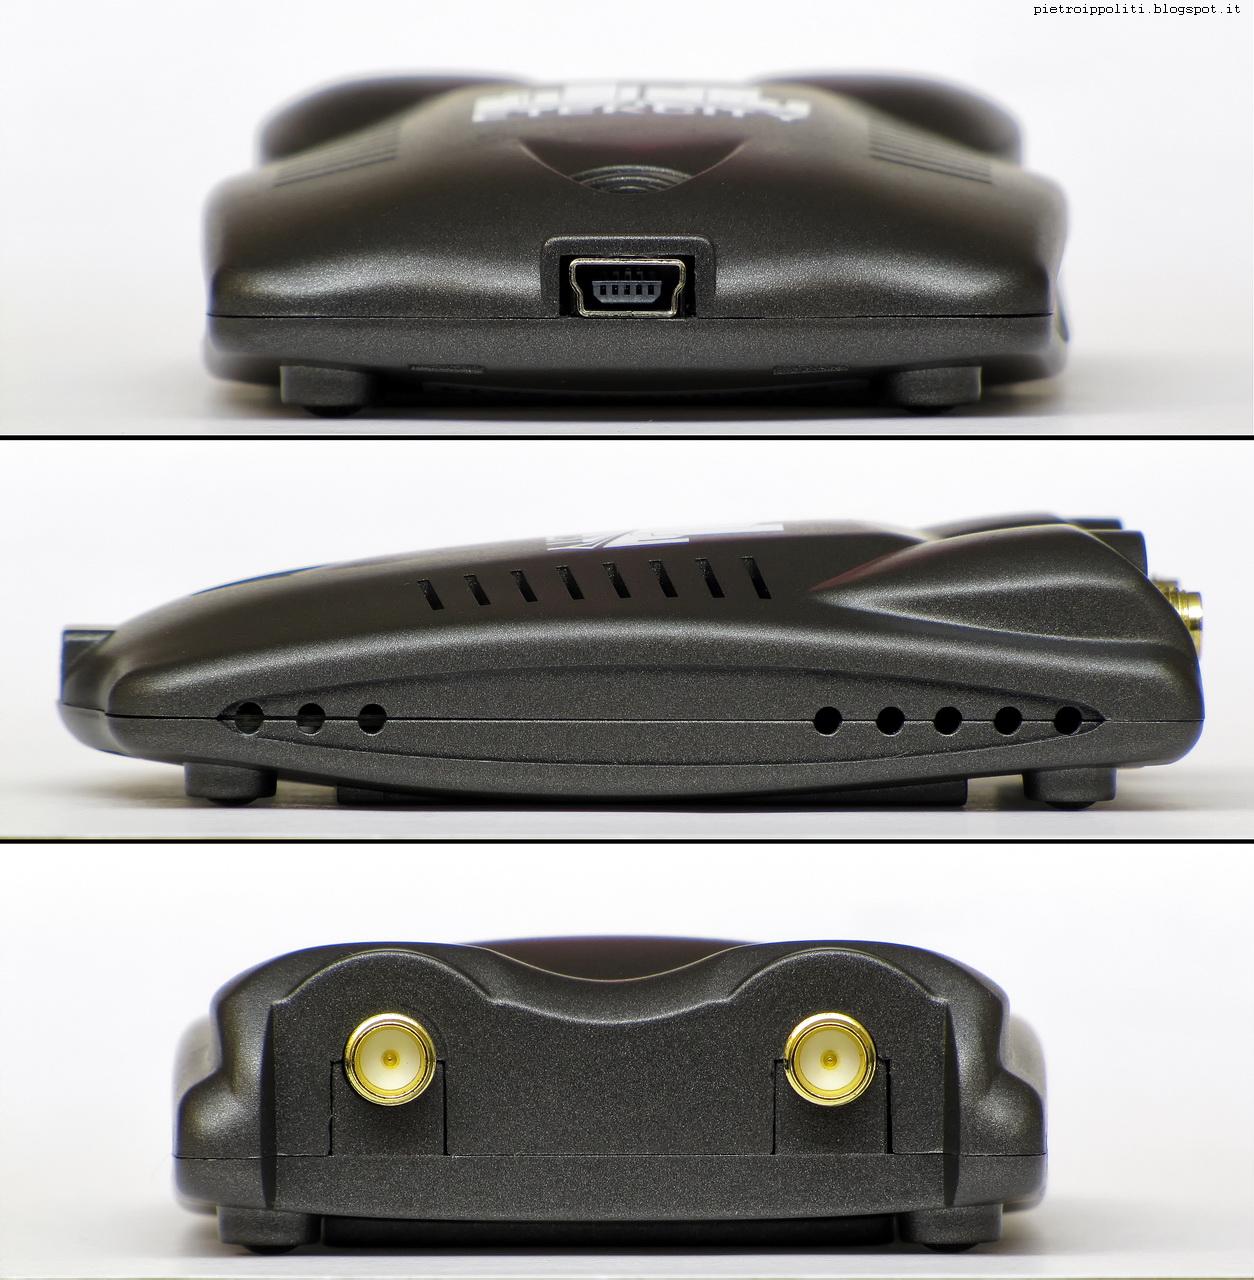 Etekcity Dual Antenna WiFi N300 USB Adapter, viste laterali